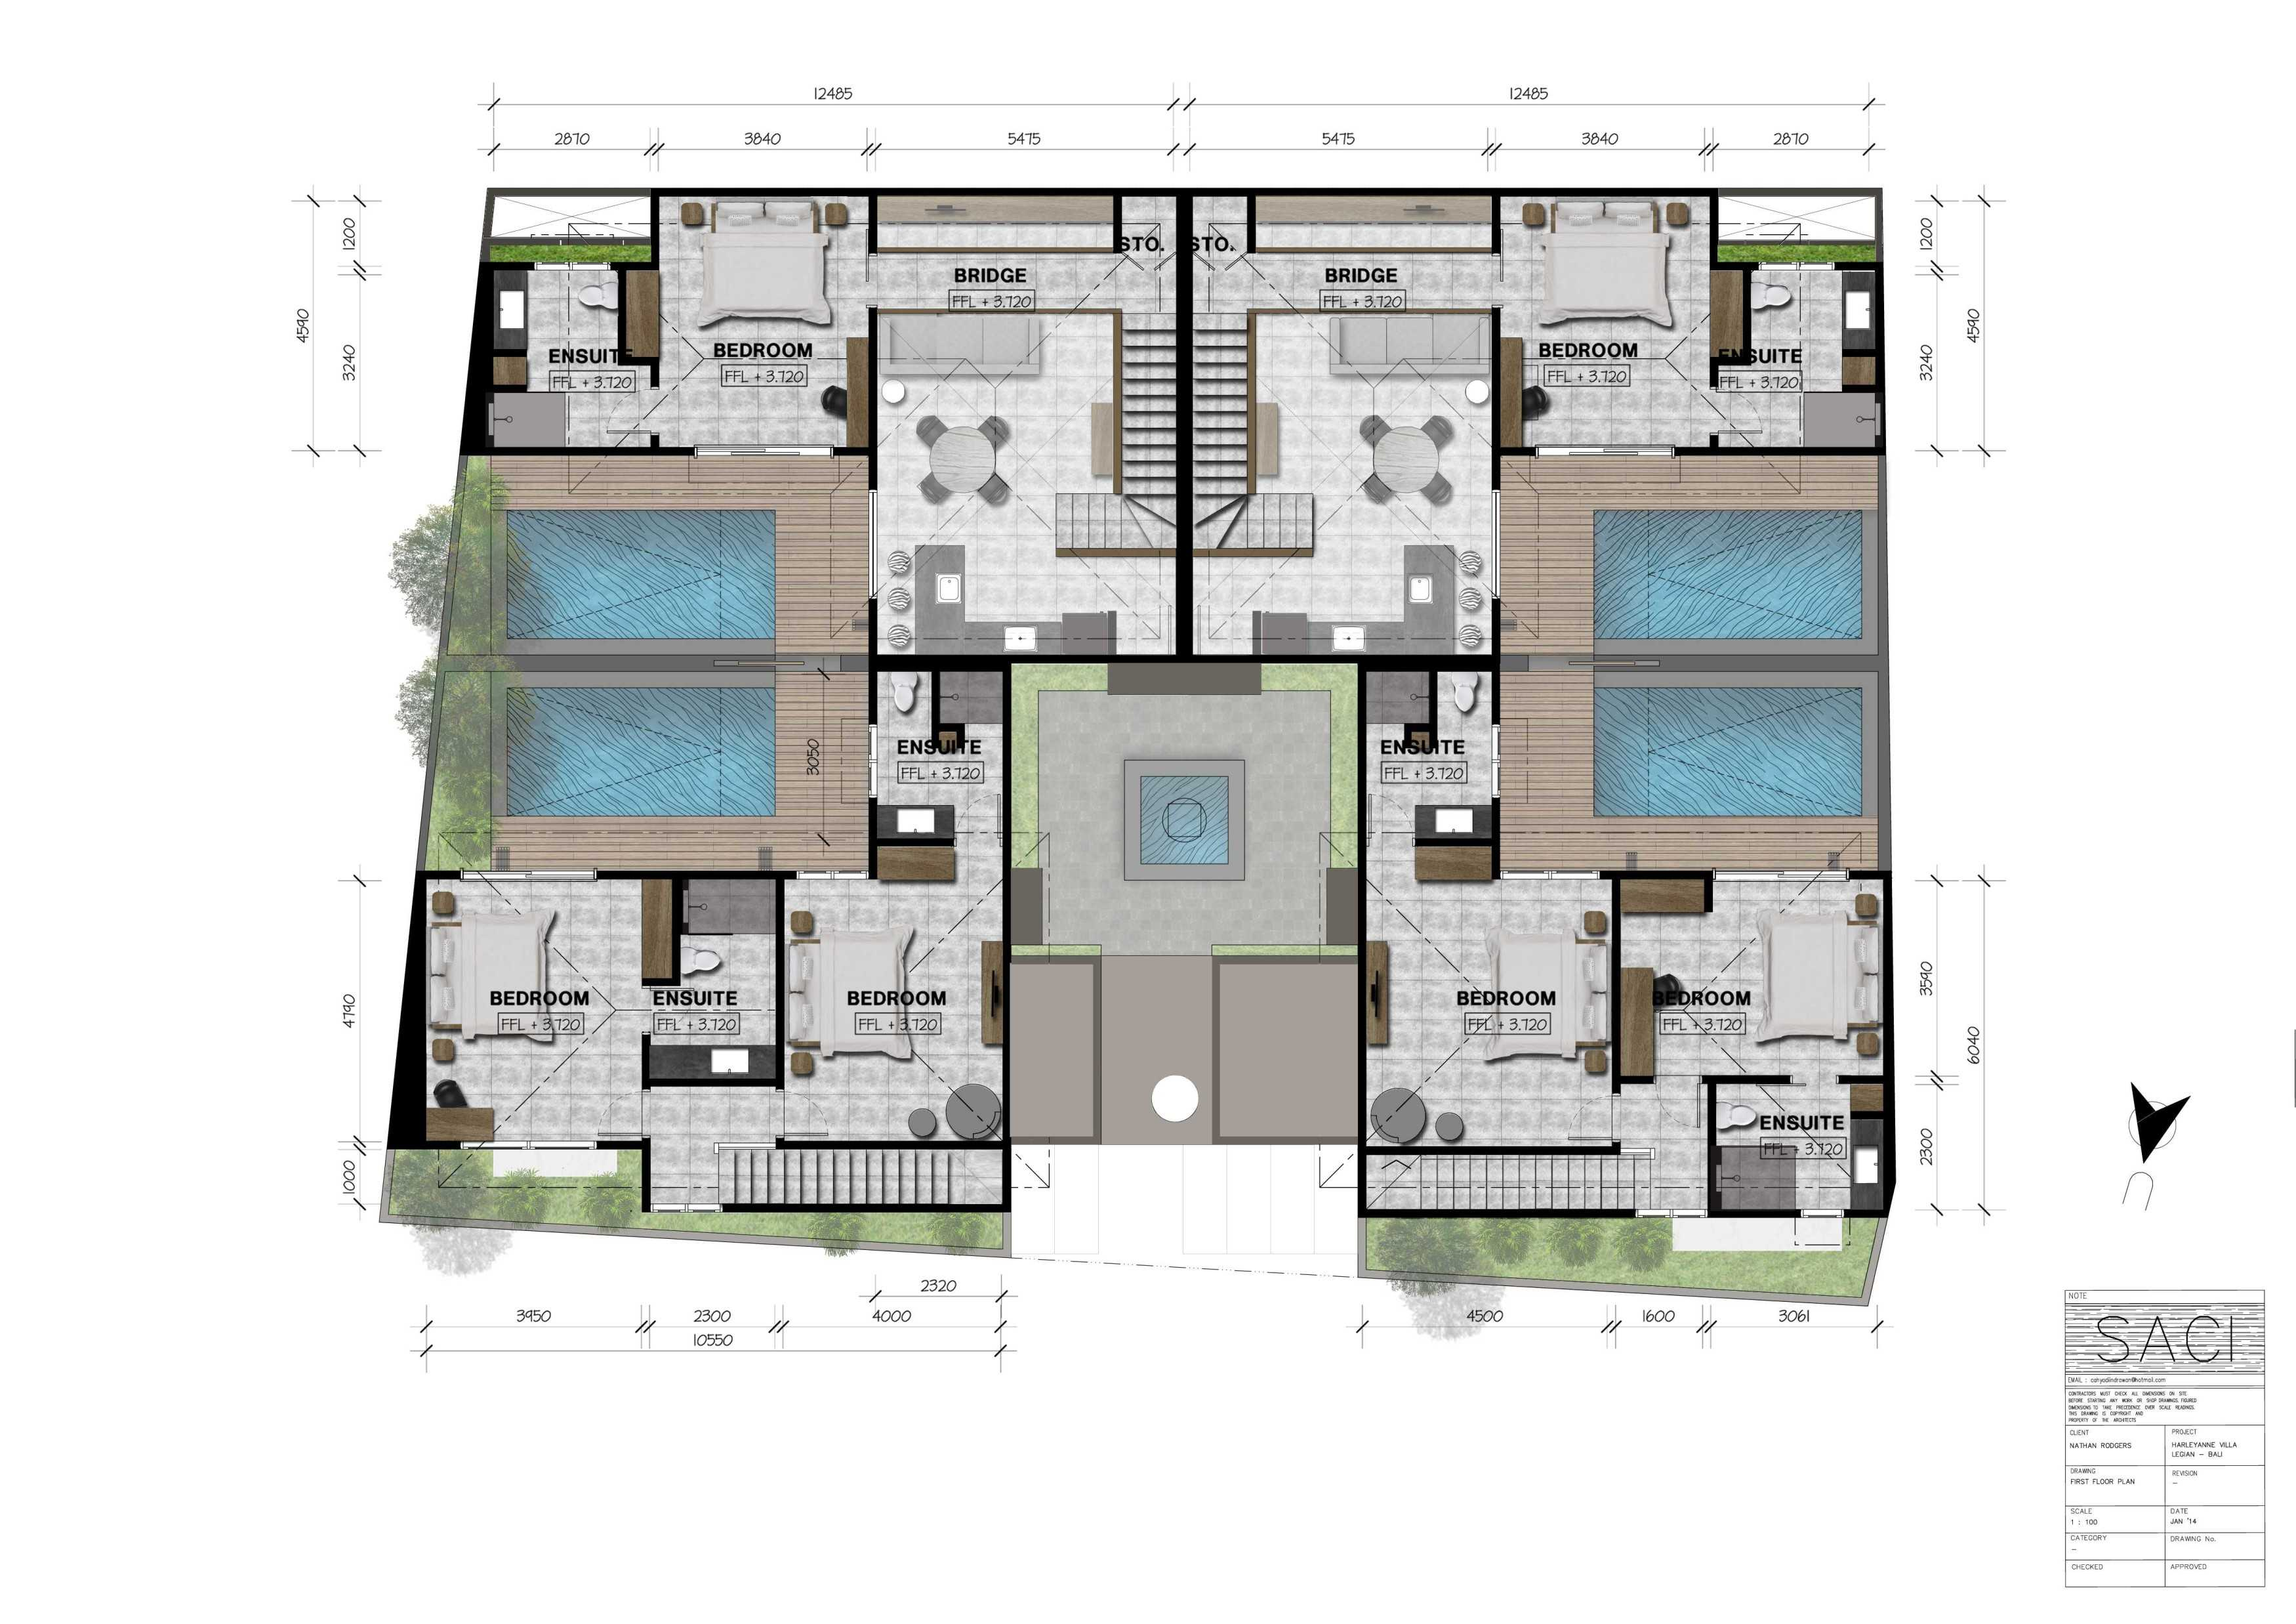 Icds Architect Harleyanne Villa Bali Bali Site Plan   15124